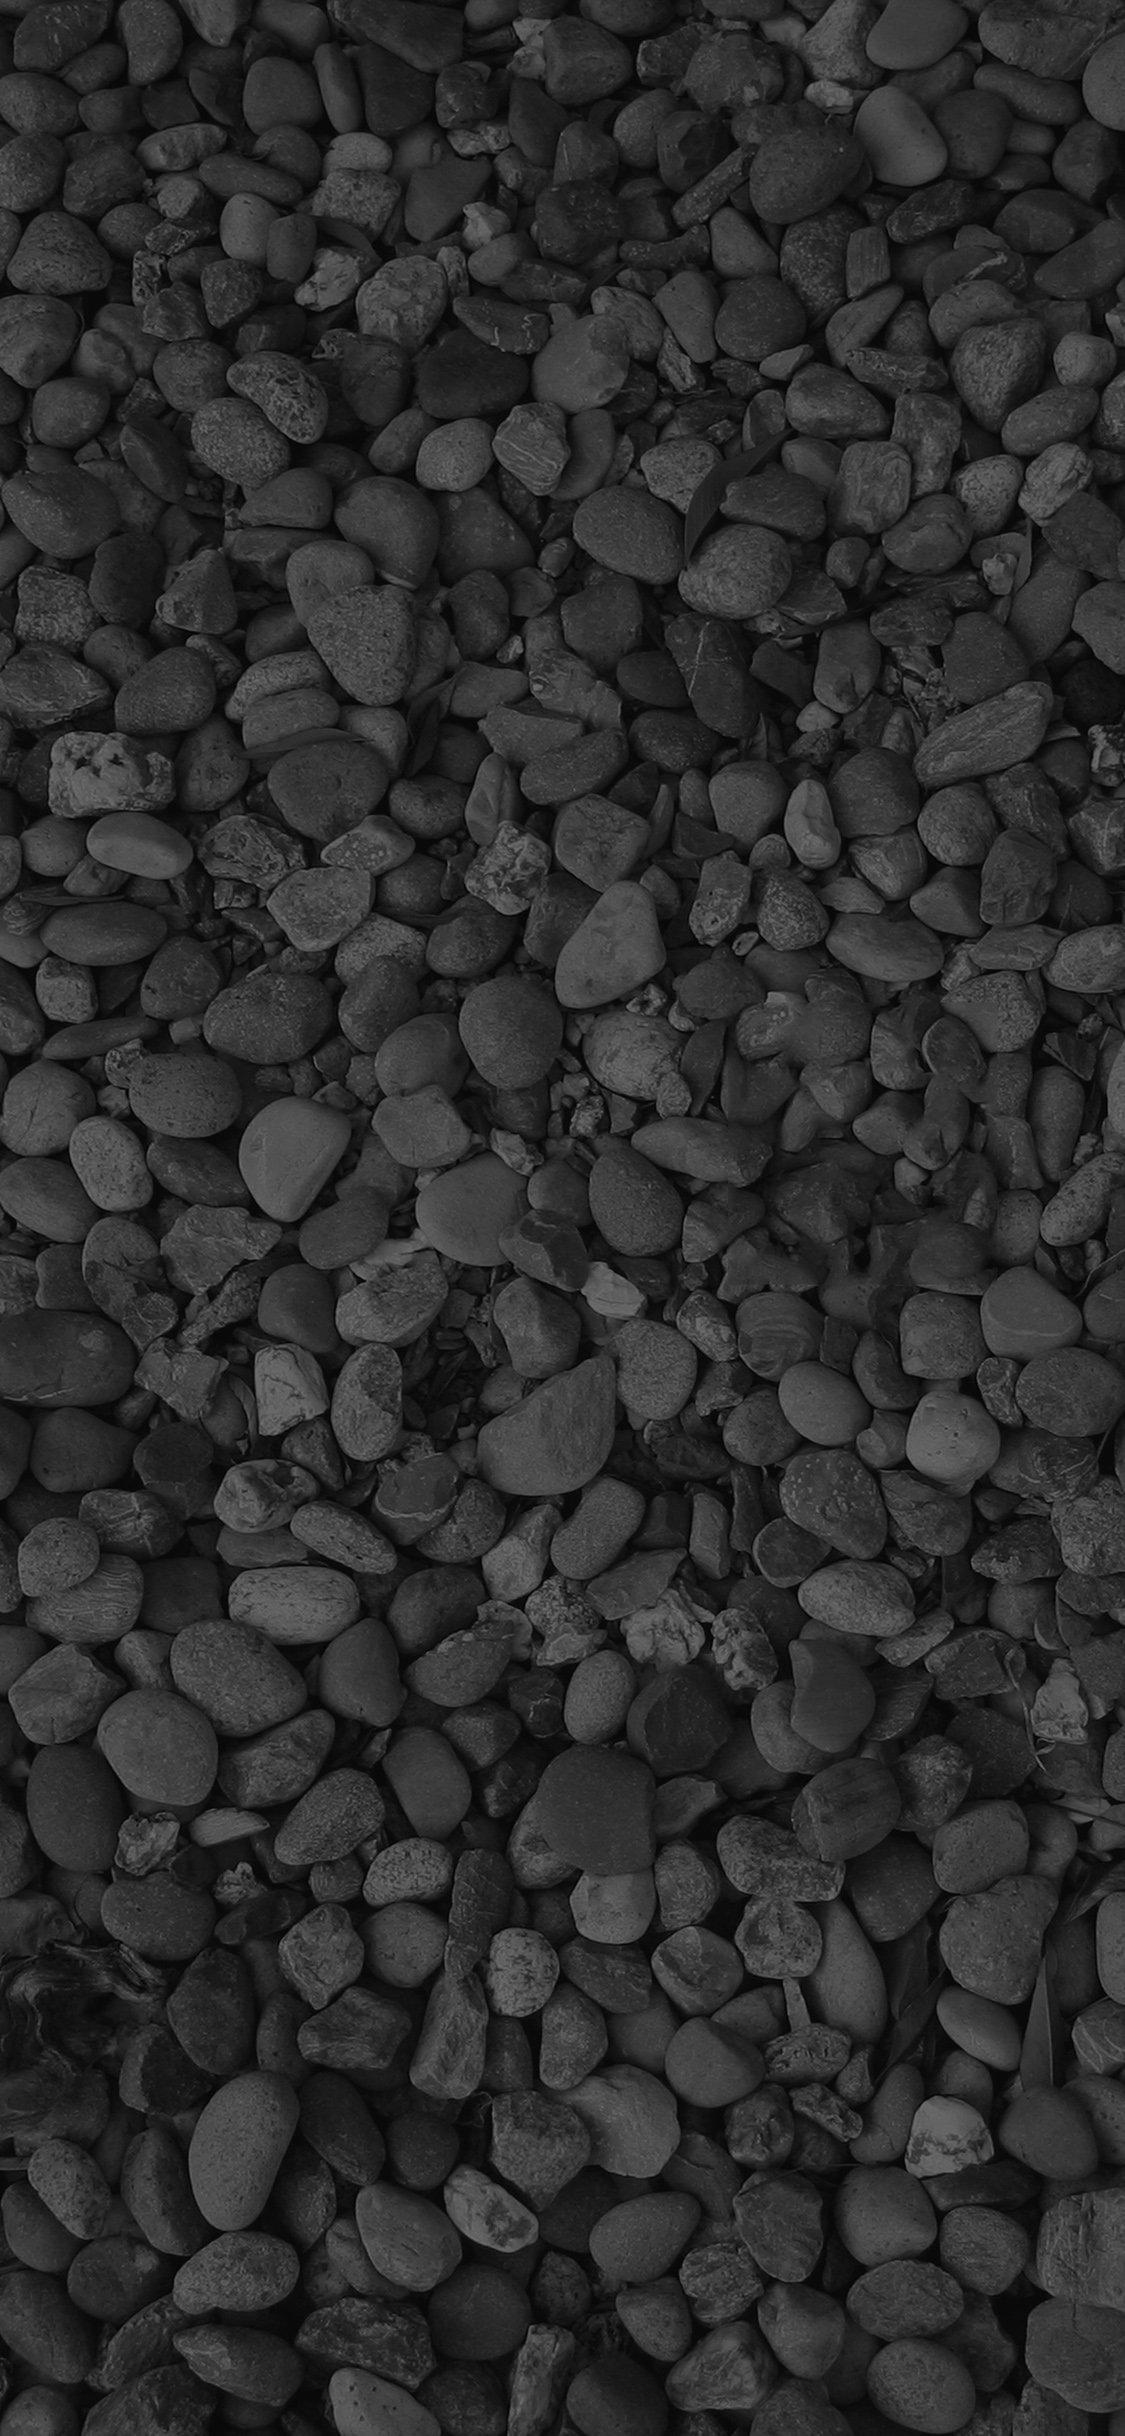 Stone Sea Dark Pattern Iphone X Wallpaper Download Iphone